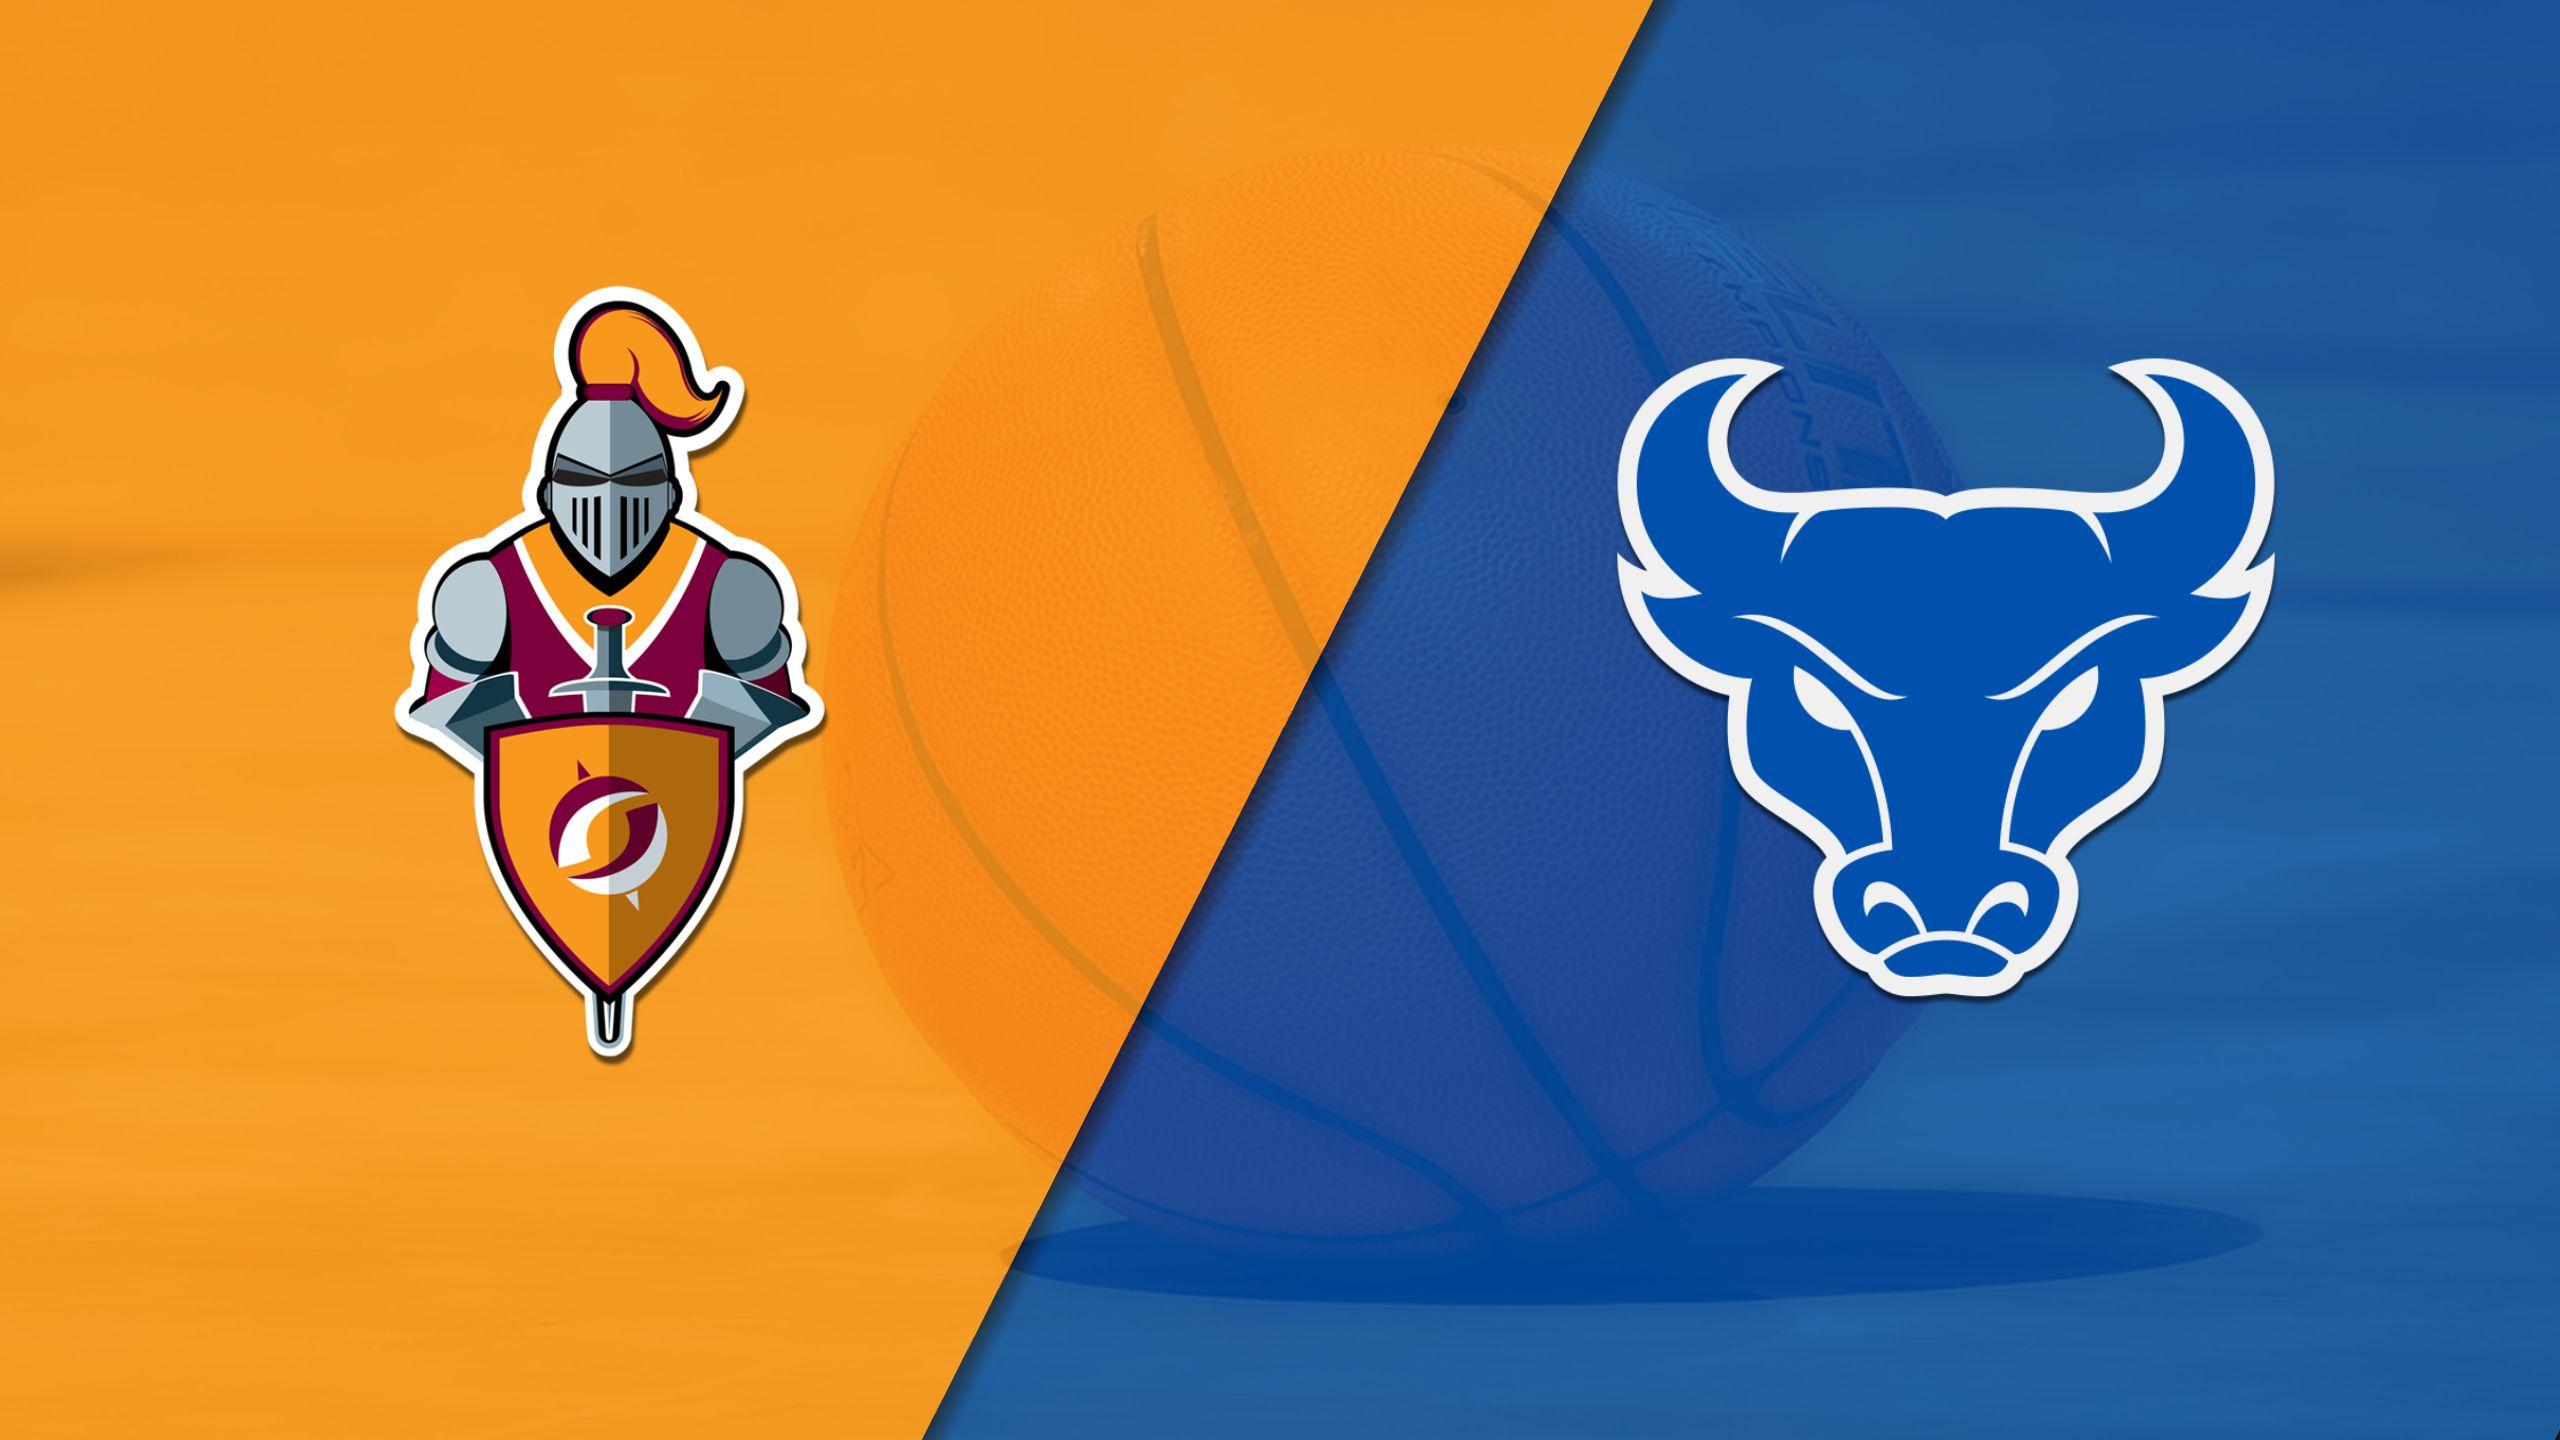 Central Penn vs. Buffalo (M Basketball)